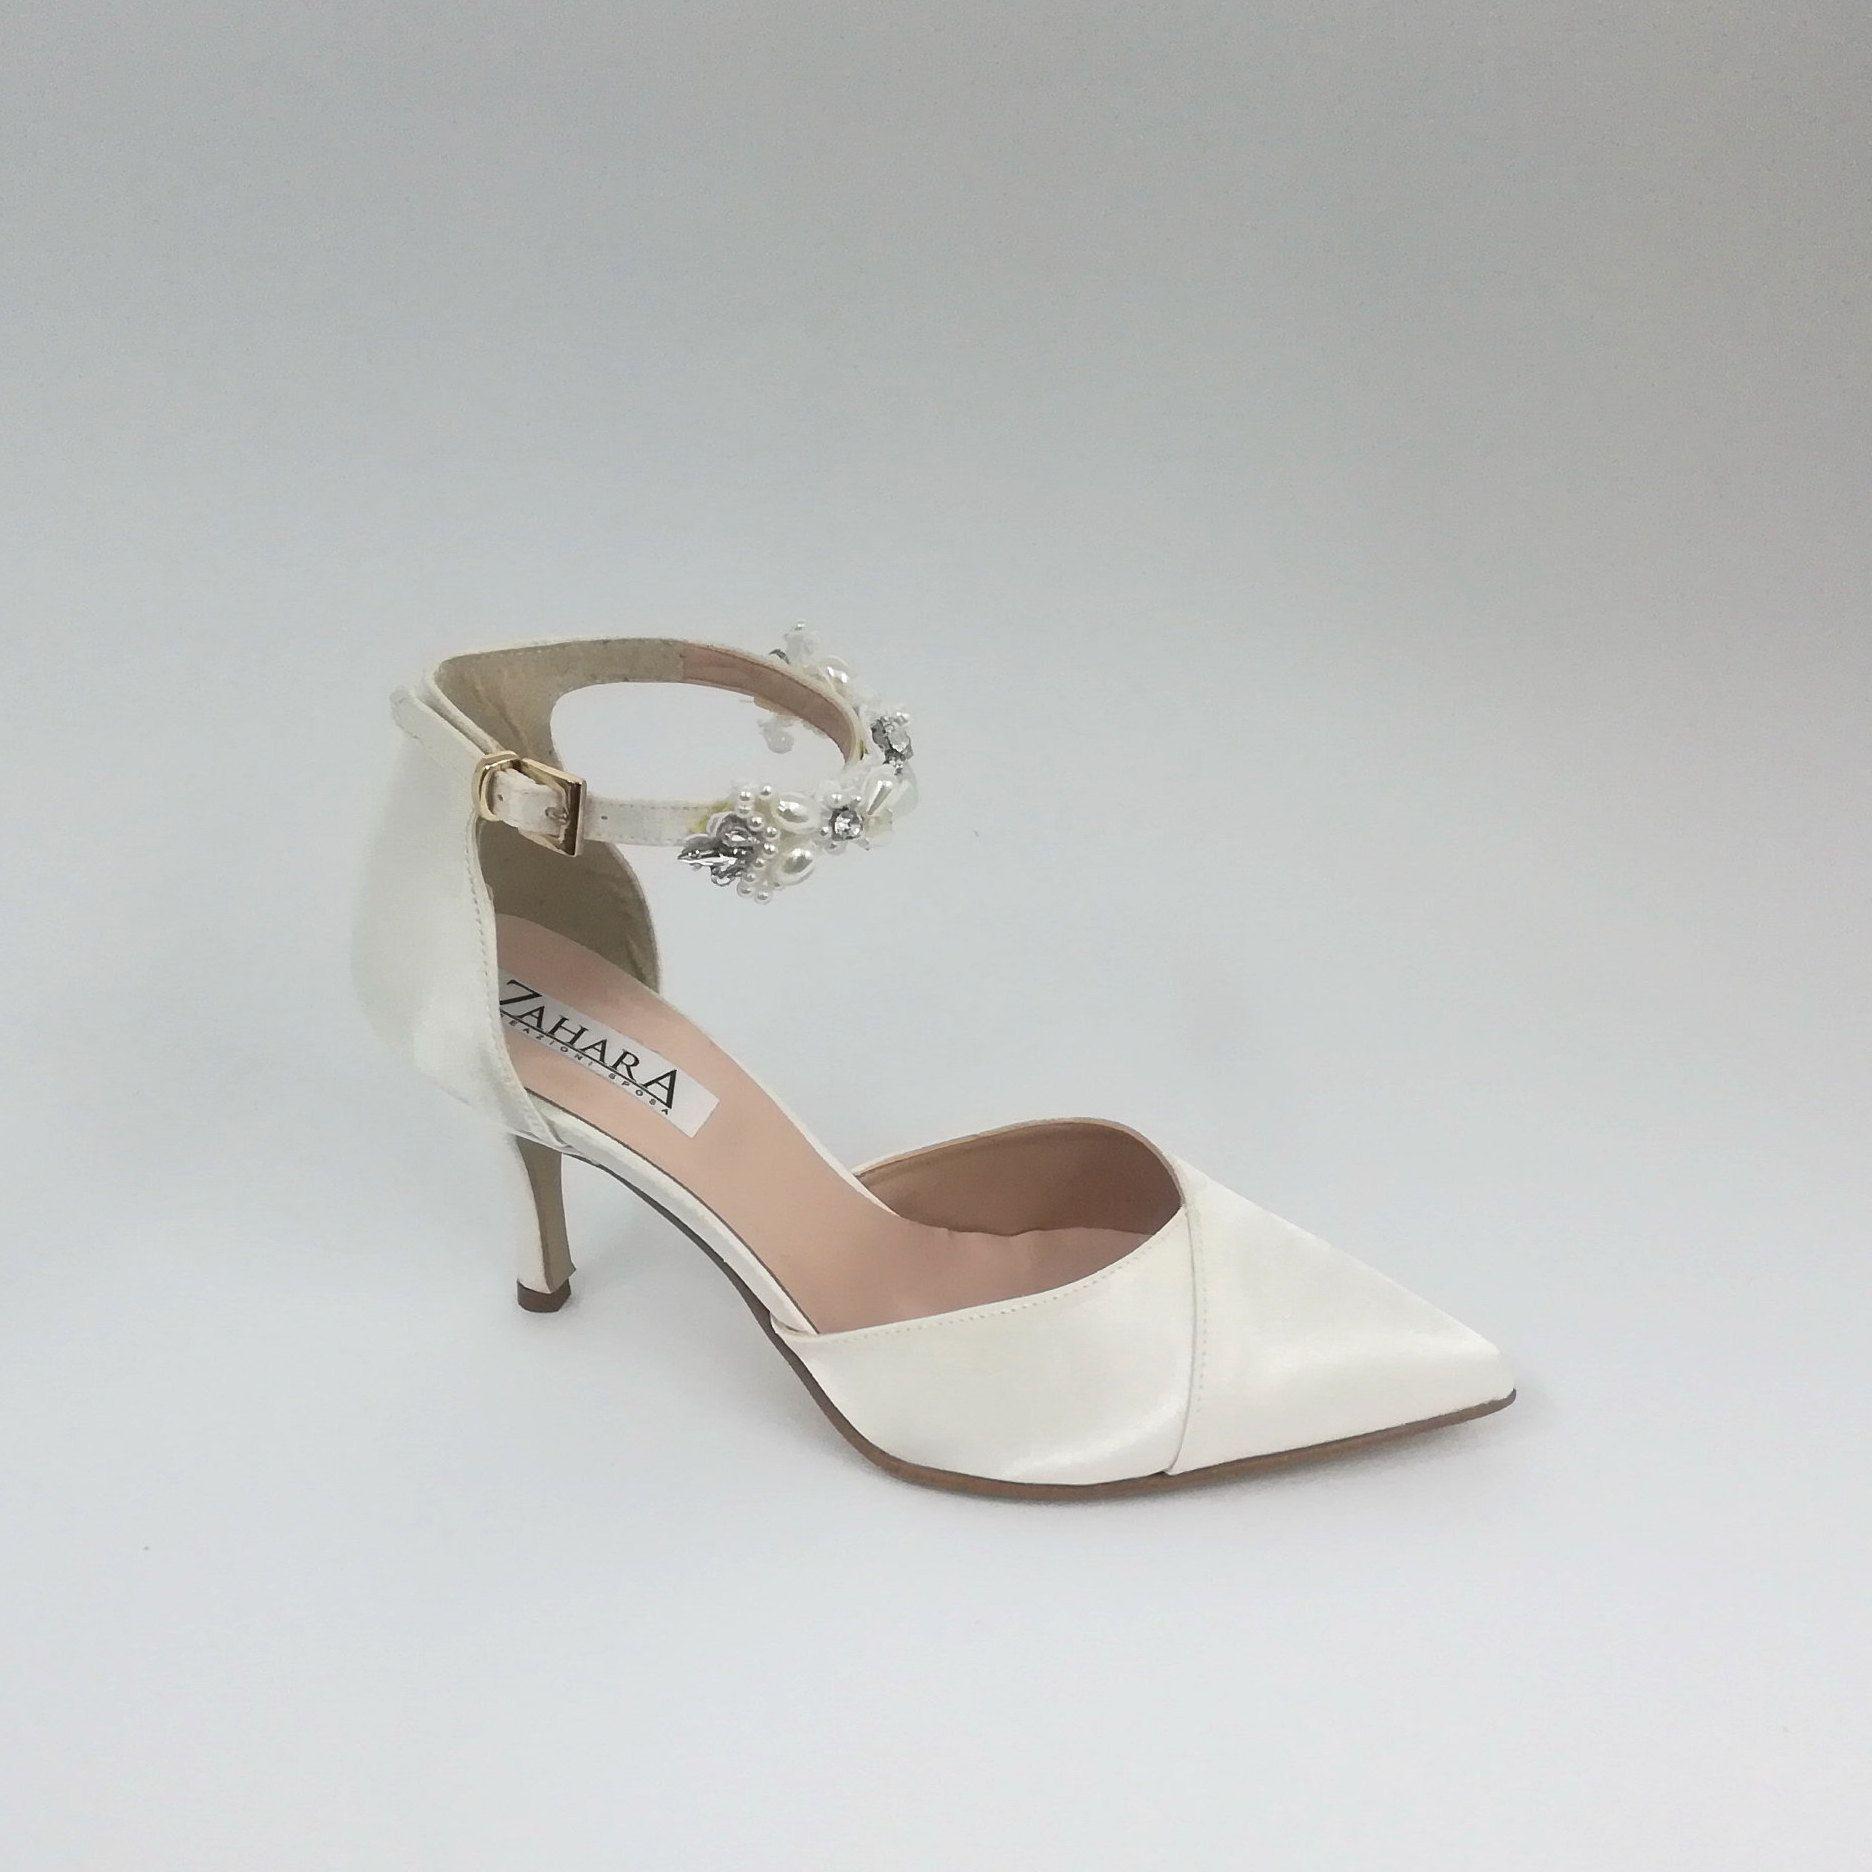 Scarpe Sposa Italia.Custom Made In Italy Bridal Shoes Nel 2020 Scarpe Da Sposa